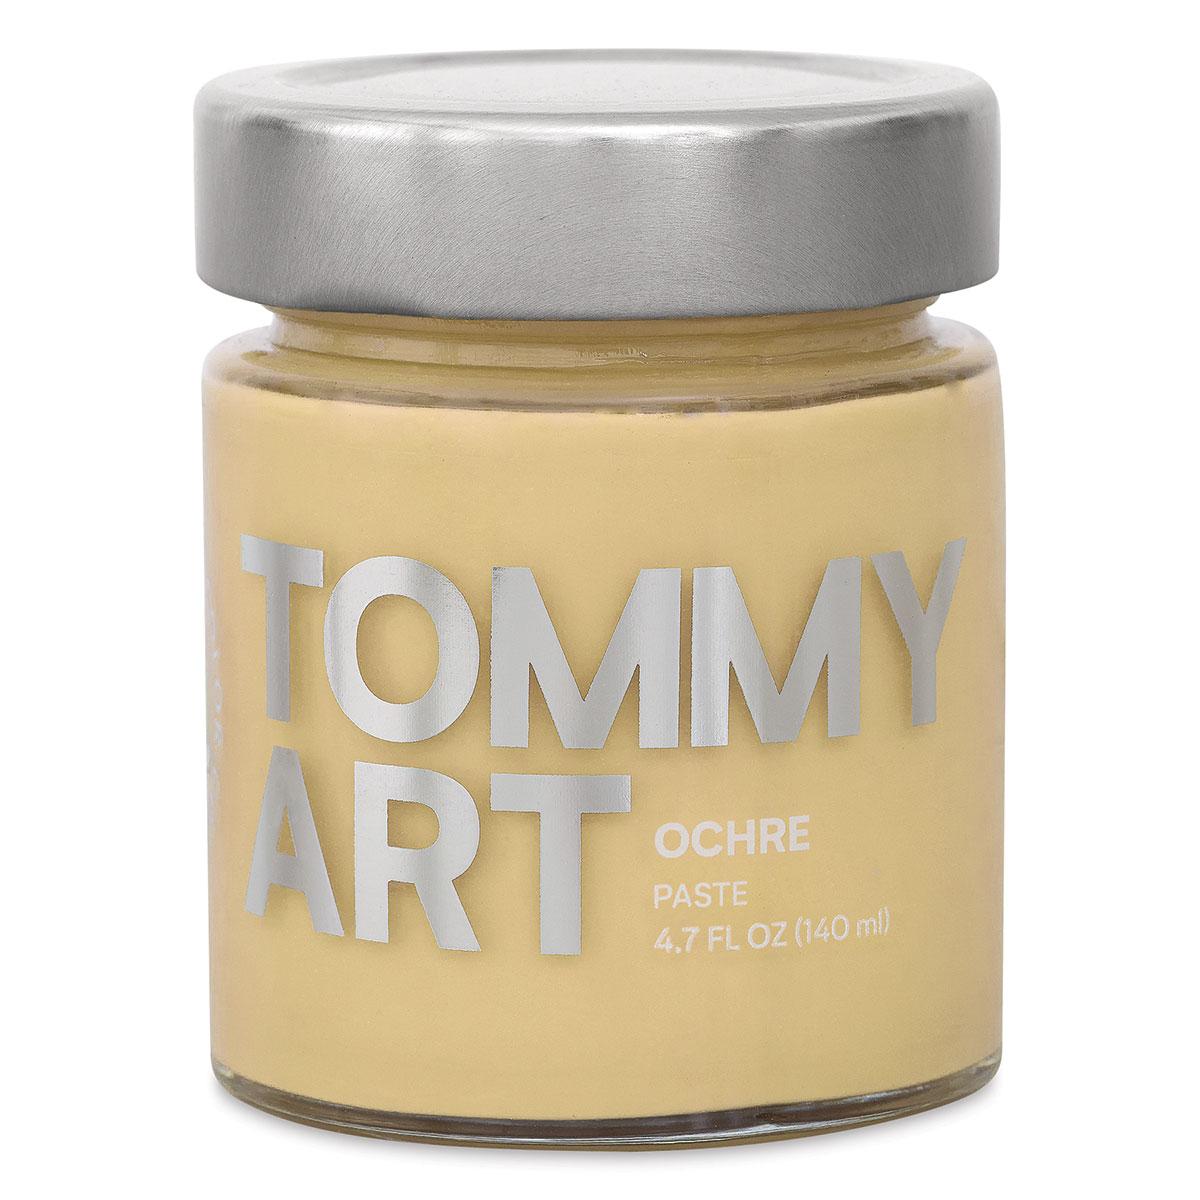 Tommy Art DIY System - Ochre Paste, 140 ml